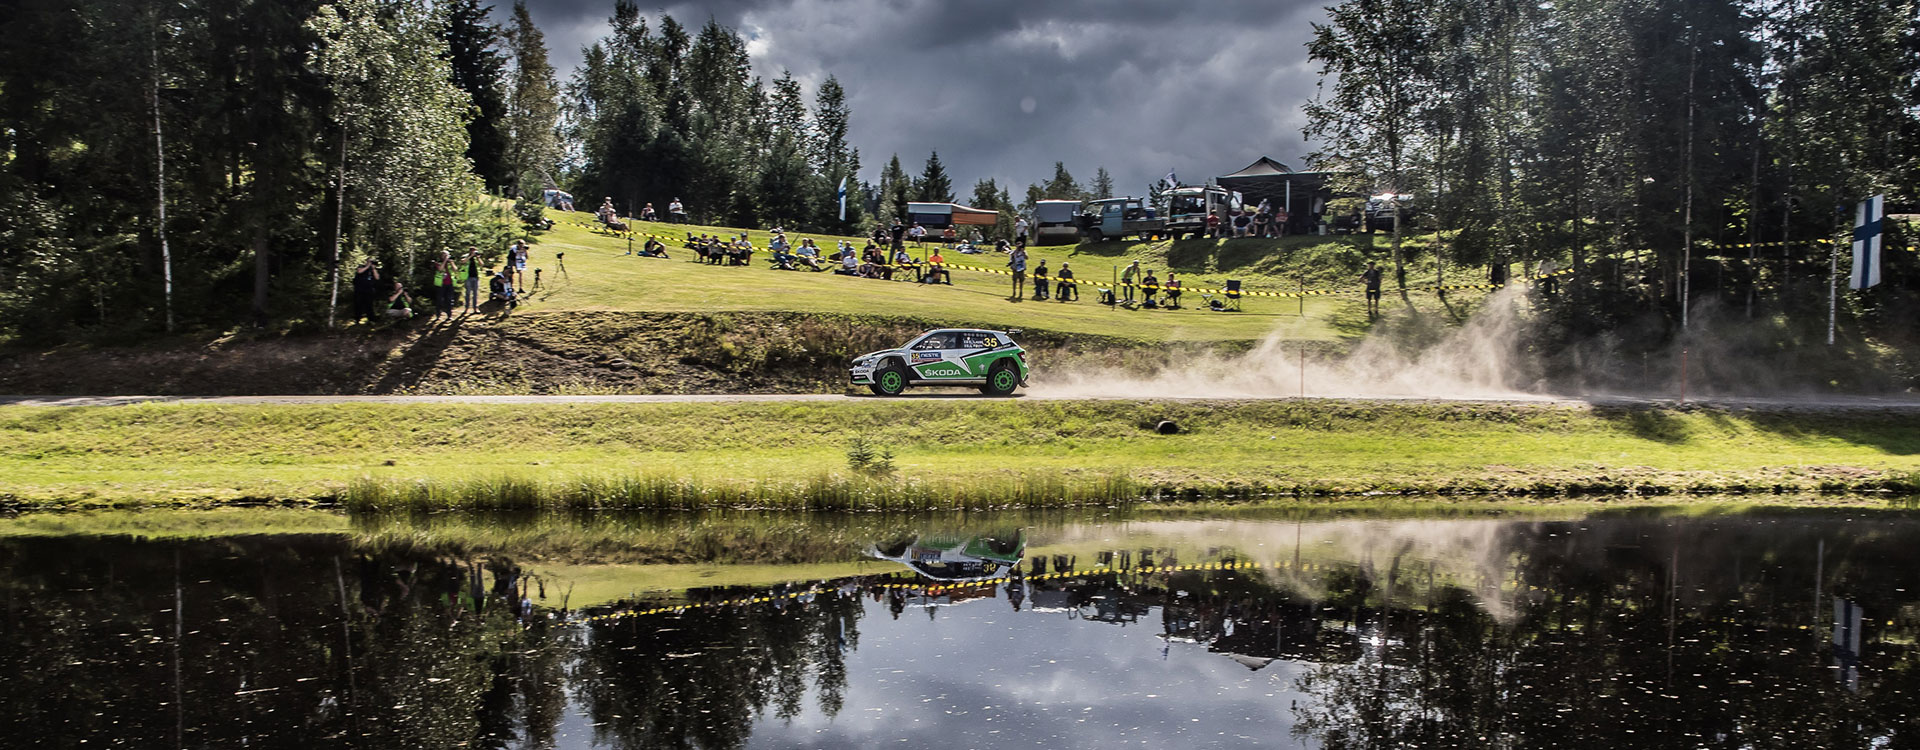 VIDEO: ŠKODA Motorsport at the Rally Finland